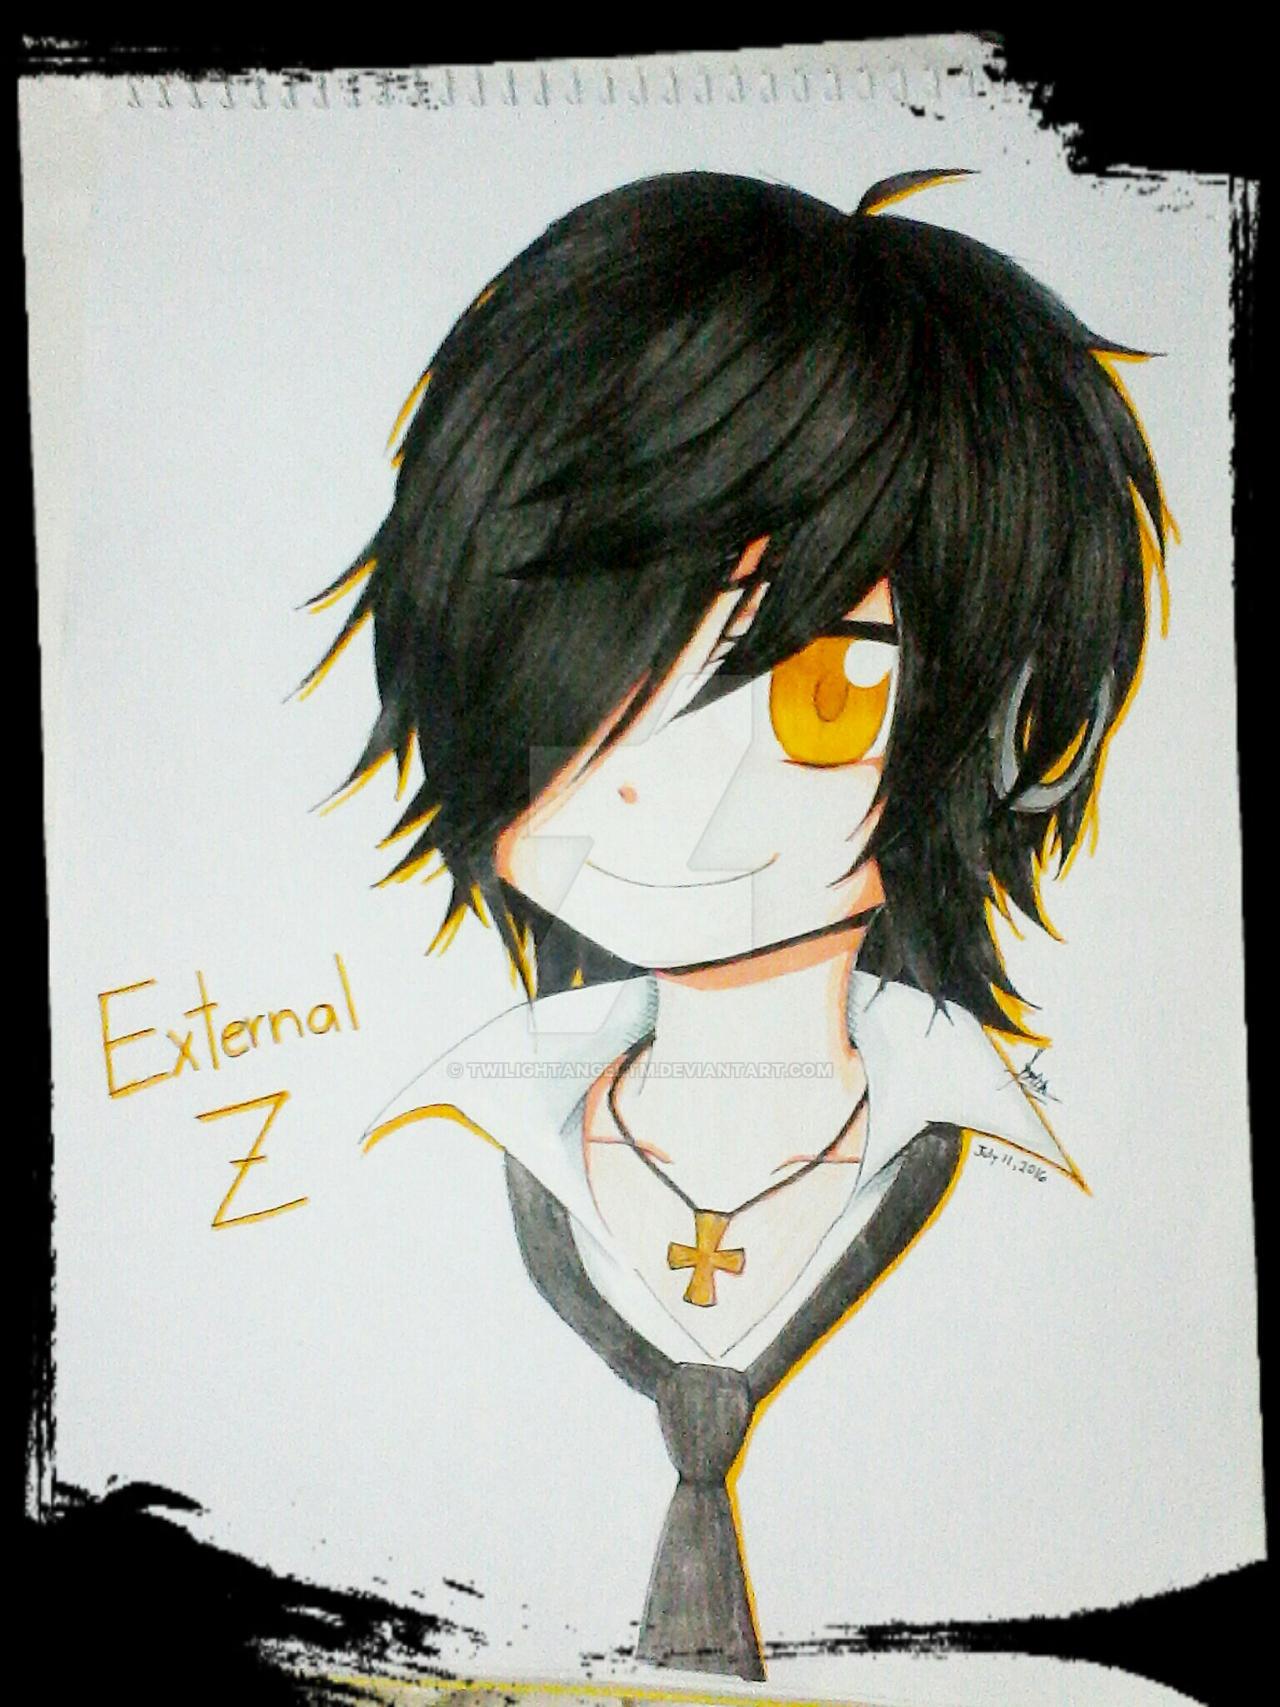 [Traditonal +Gift] Zeze-kun! by TwilightAngelTM